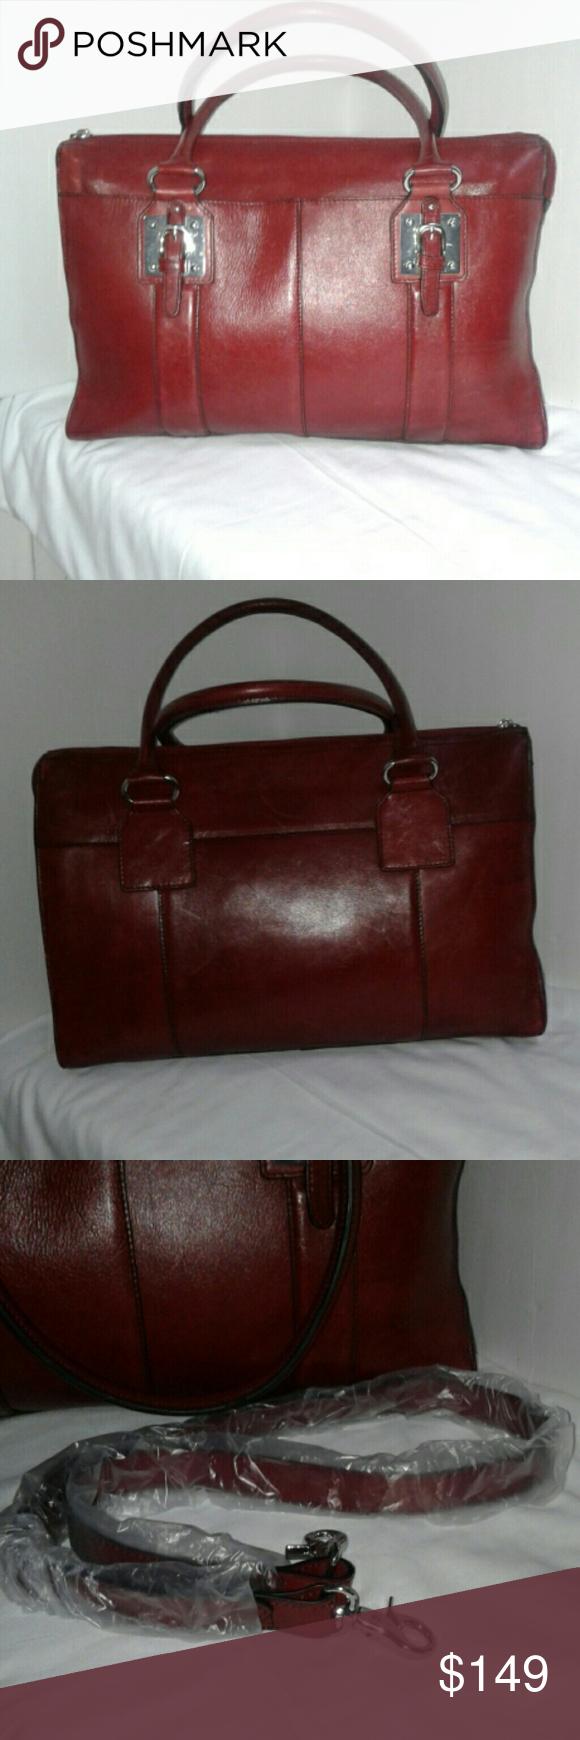 Wilson's Leather Tablet Laptop Bag Red Burgundy Wilsons